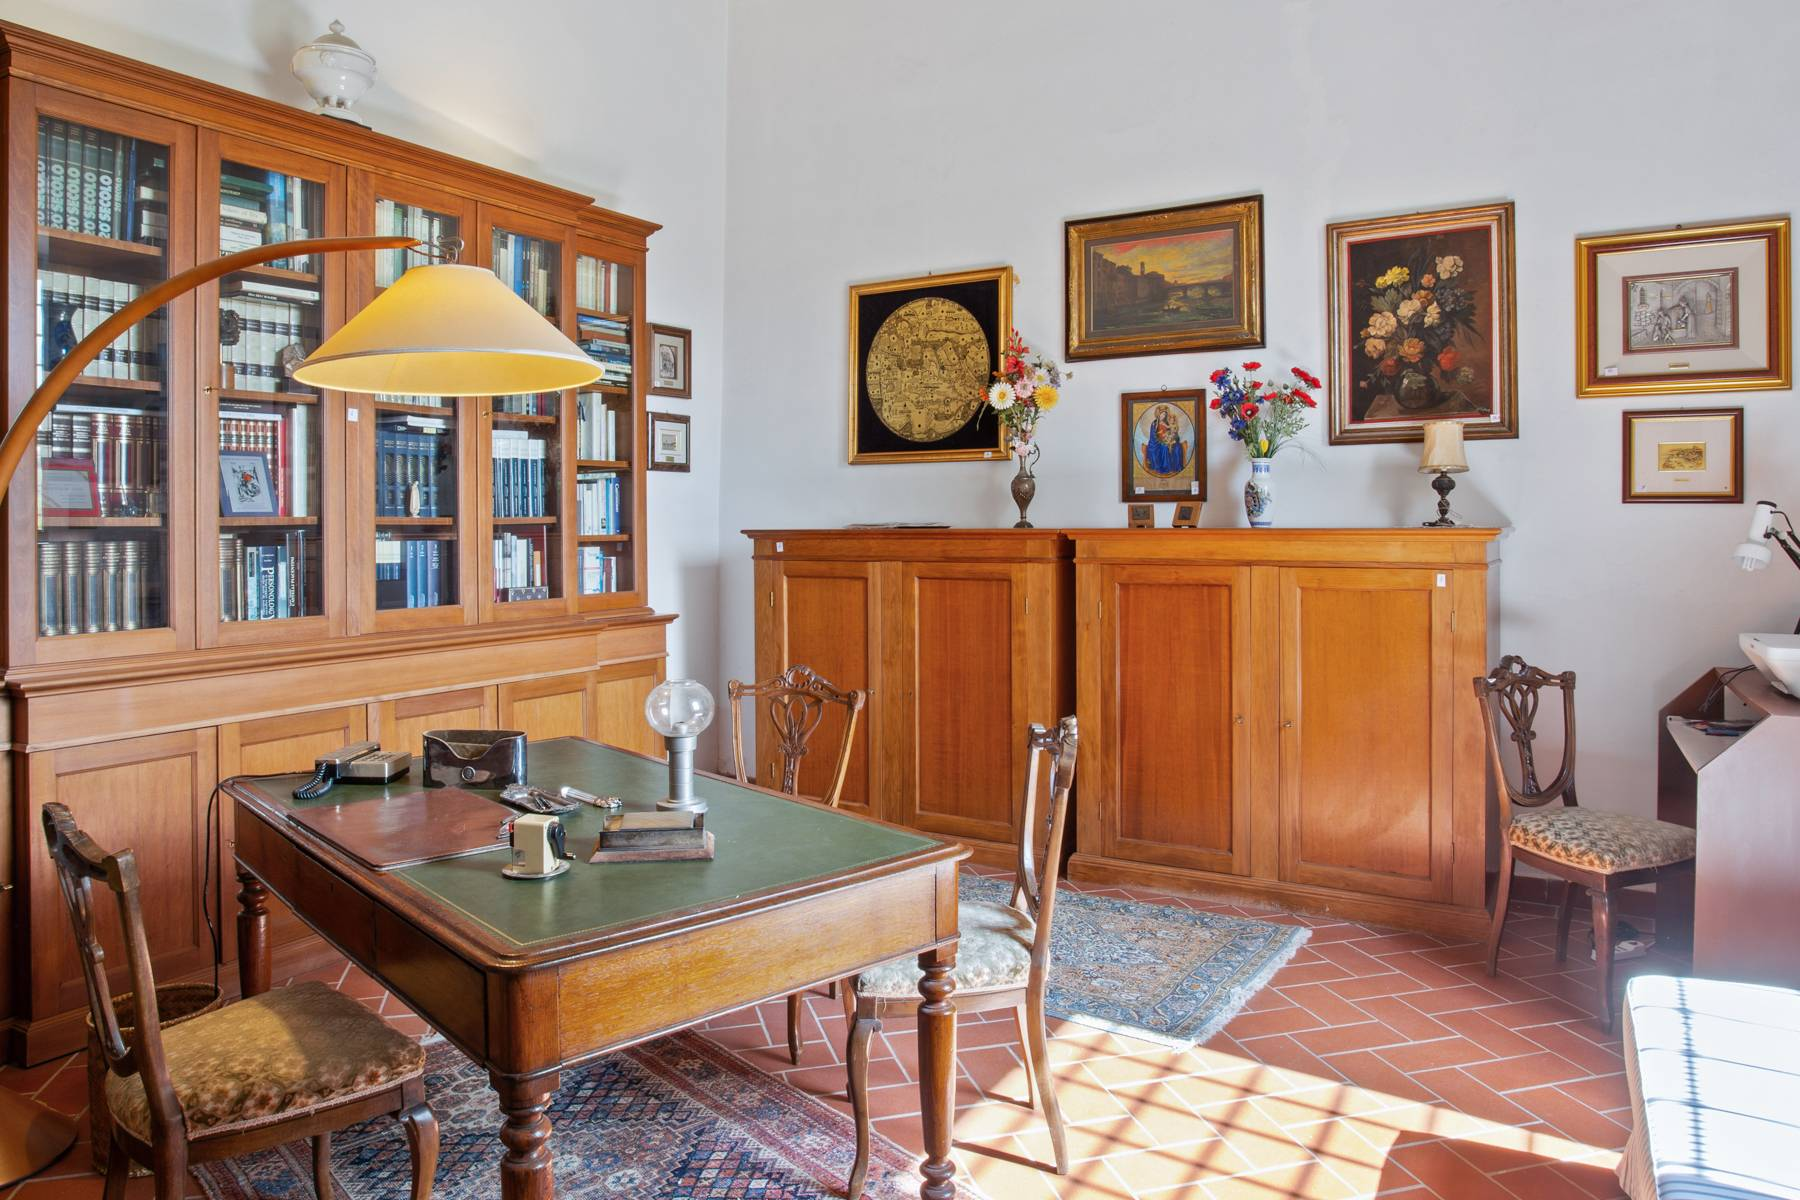 Appartamento in Vendita a Scandicci: 5 locali, 140 mq - Foto 3